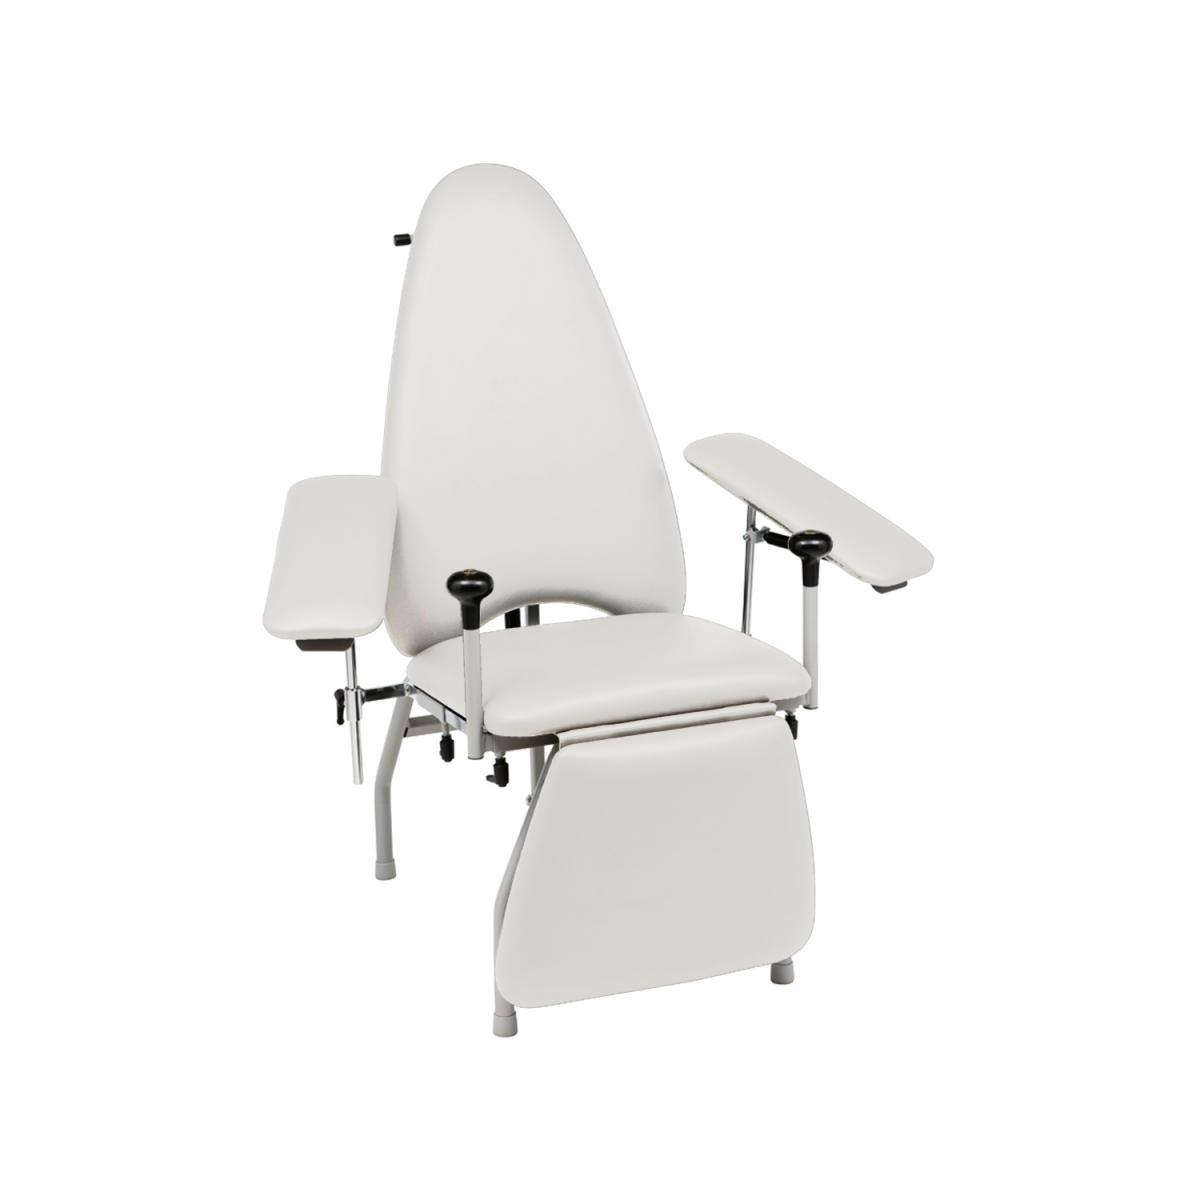 Sampling chair 072